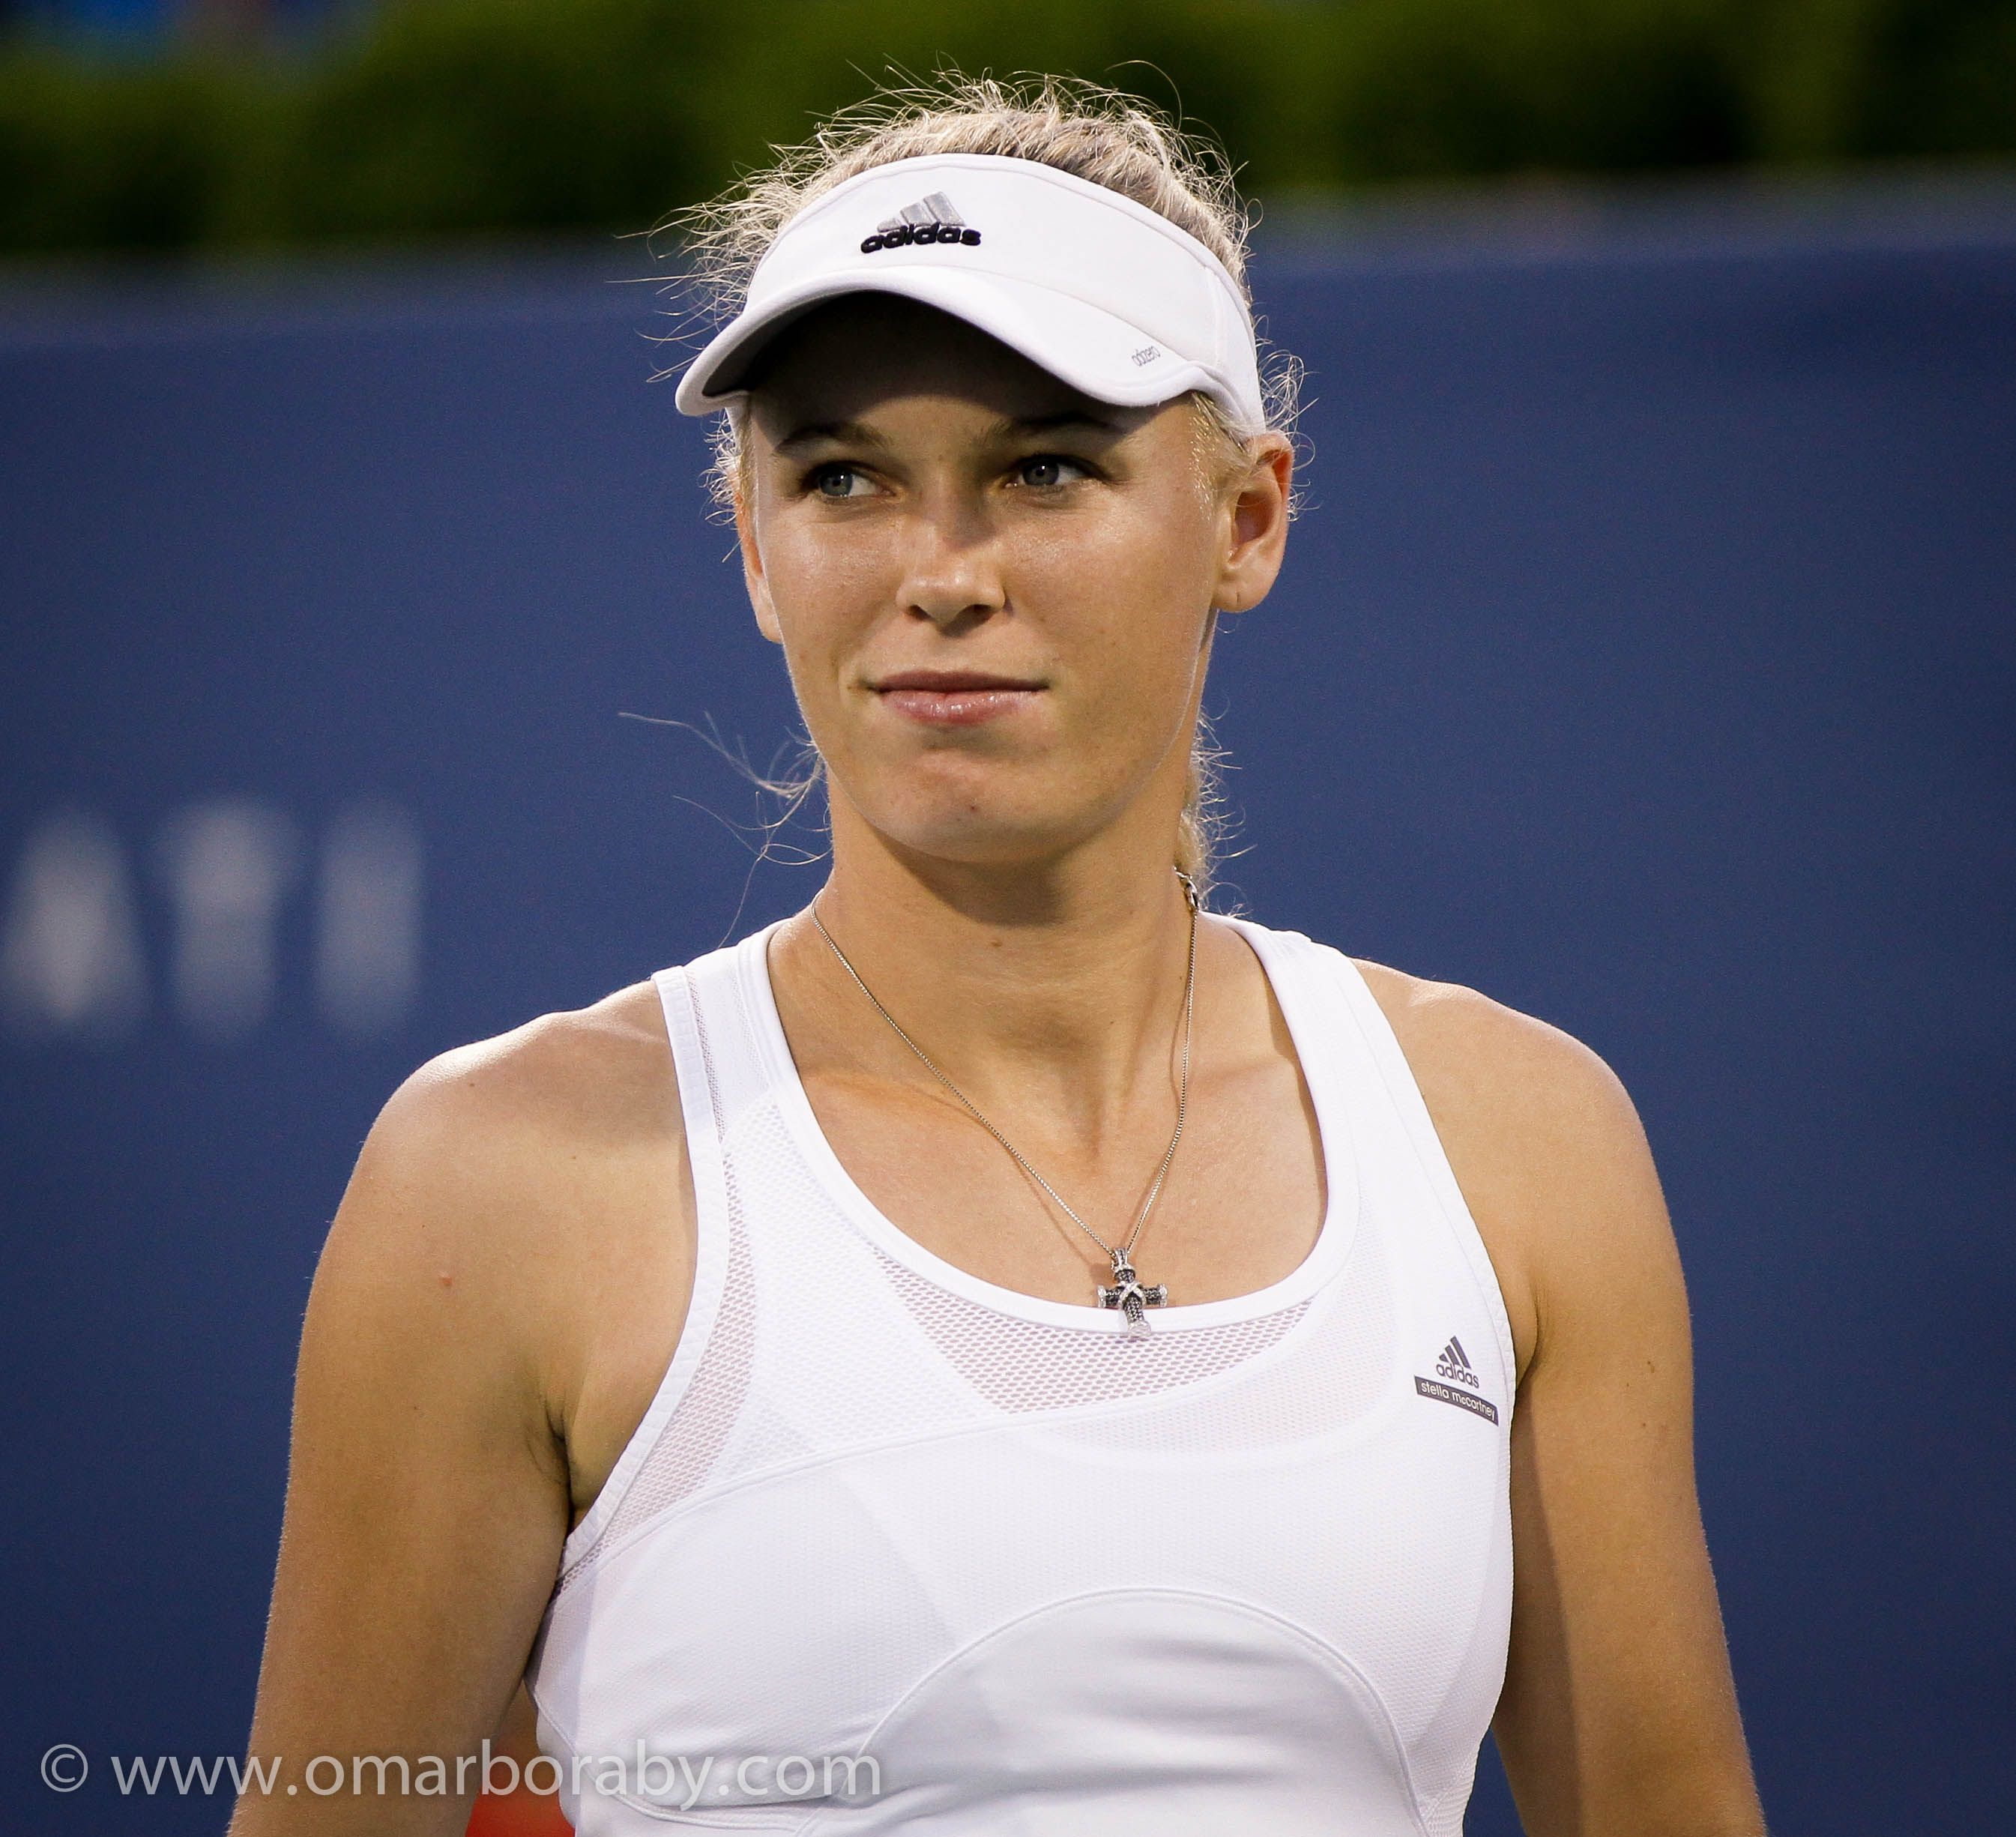 Wta: WTA Predictions For 2015